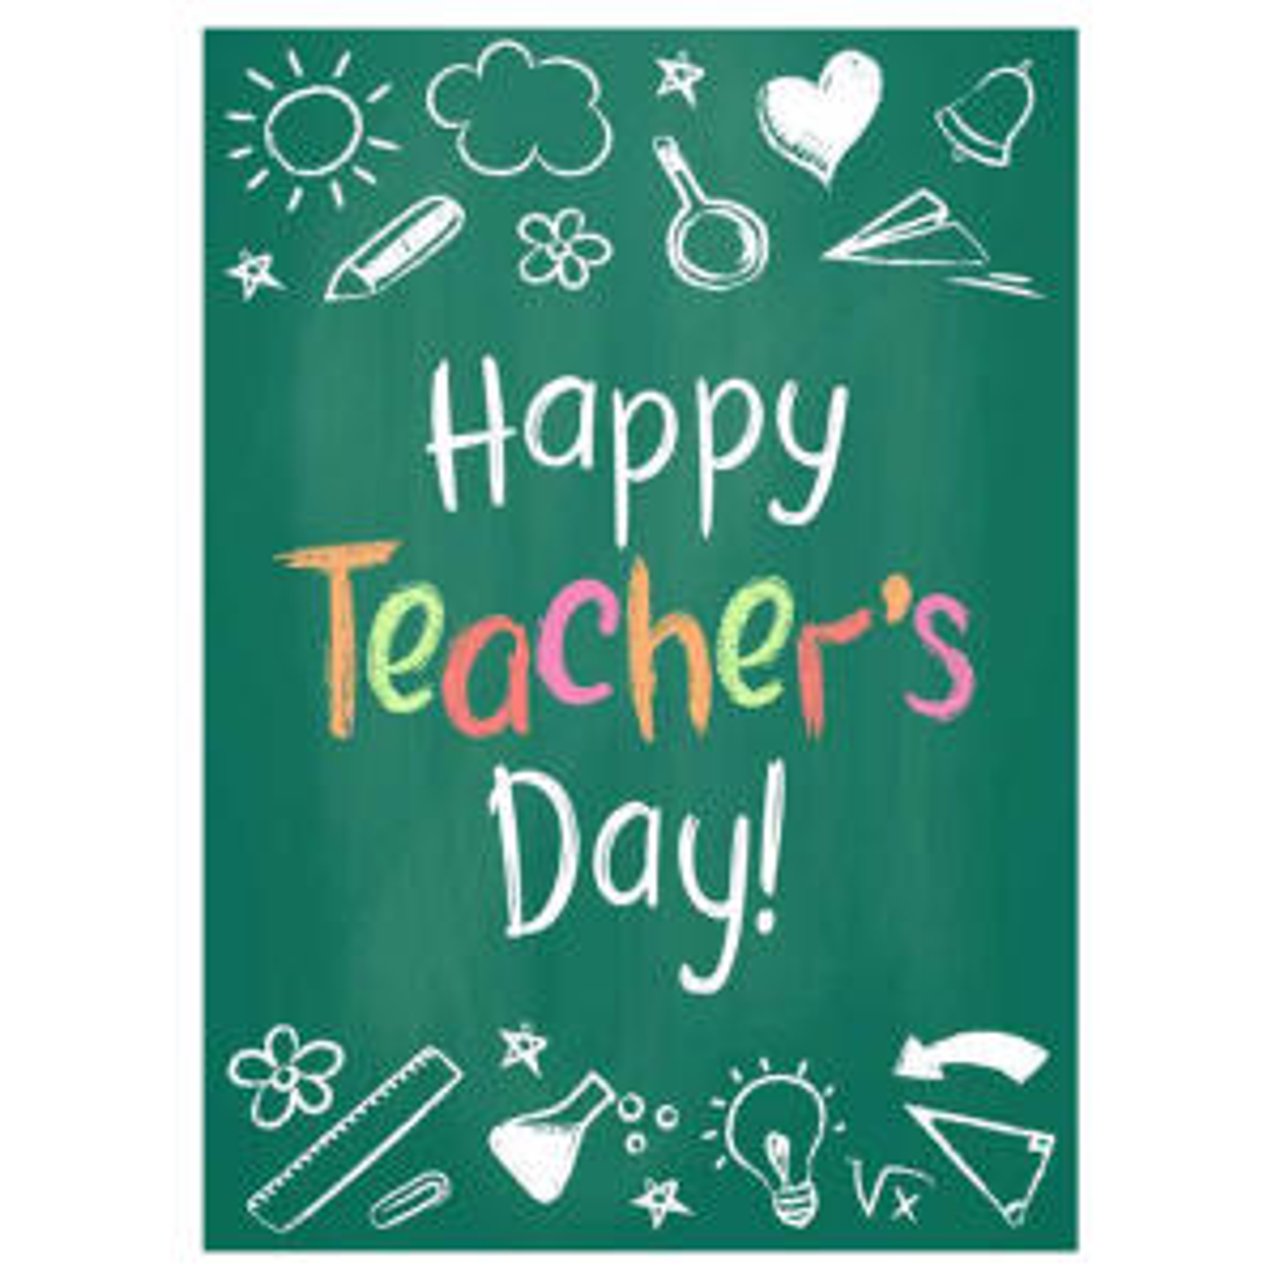 کارت پستال ماهتاب طرح روز معلم مبارک کد 1475